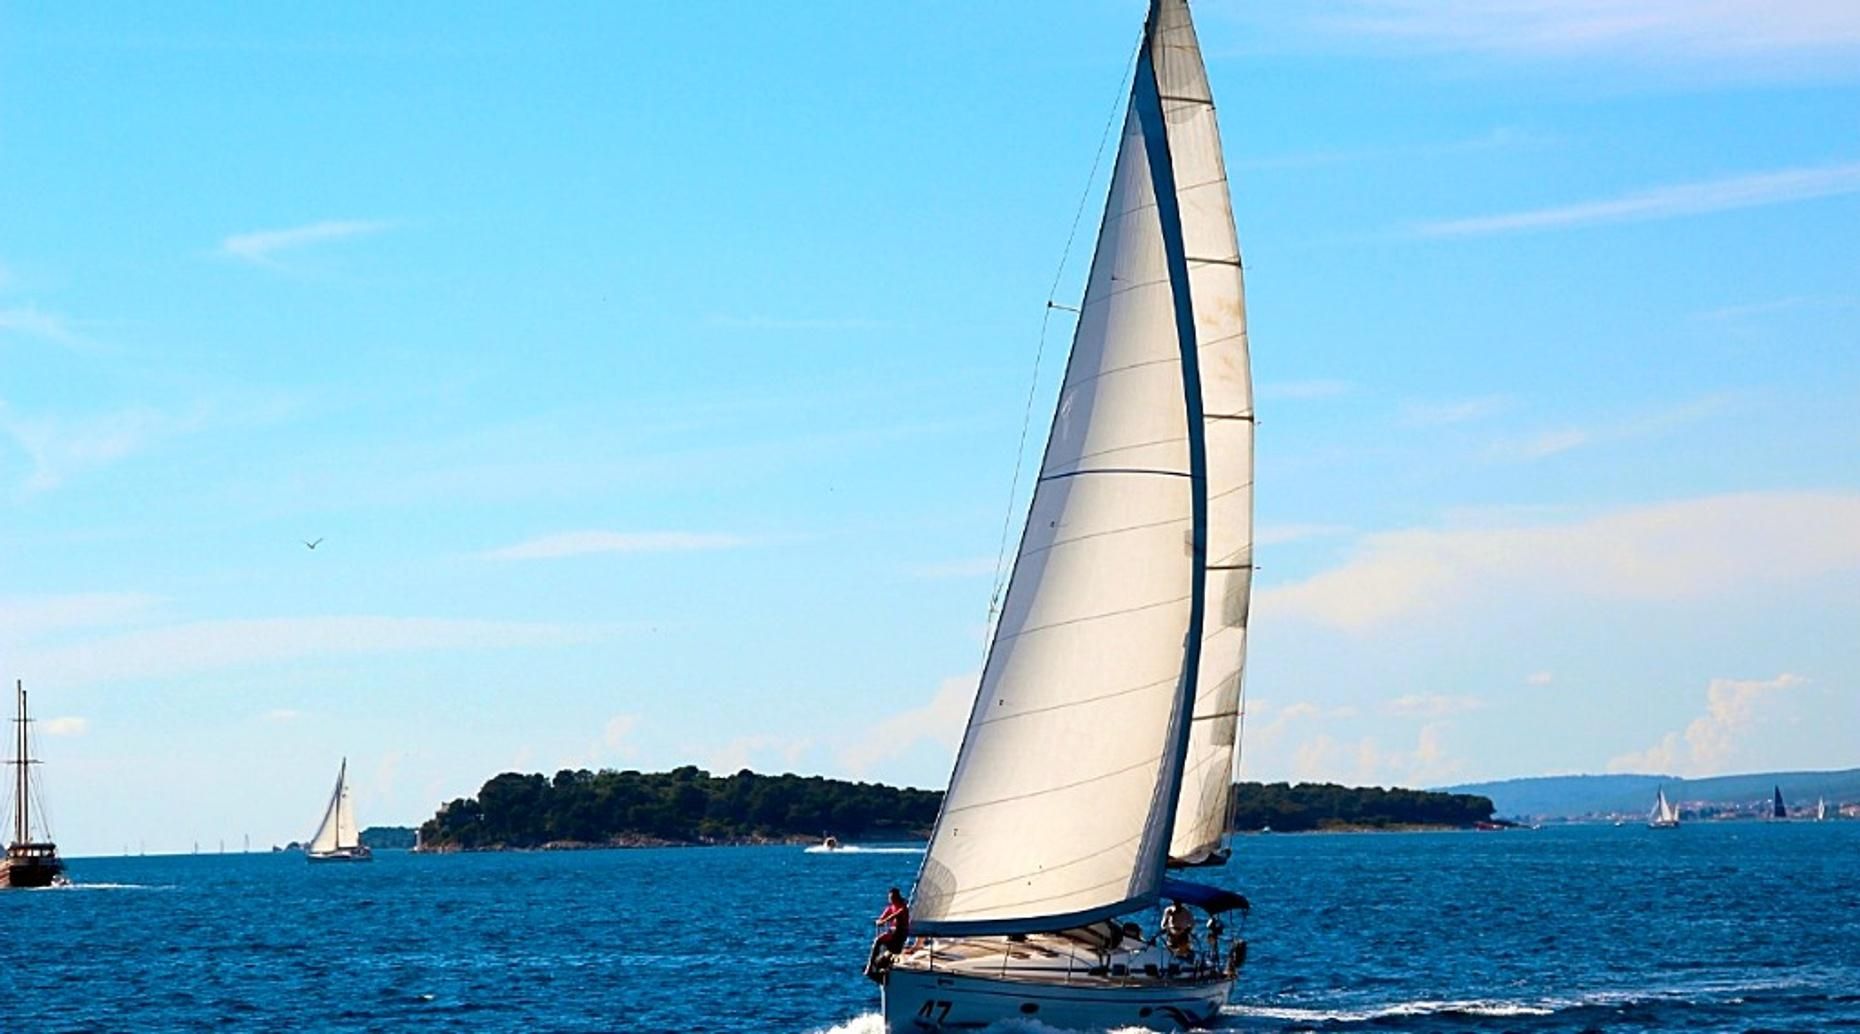 4-Hour Customized Sail in Destin